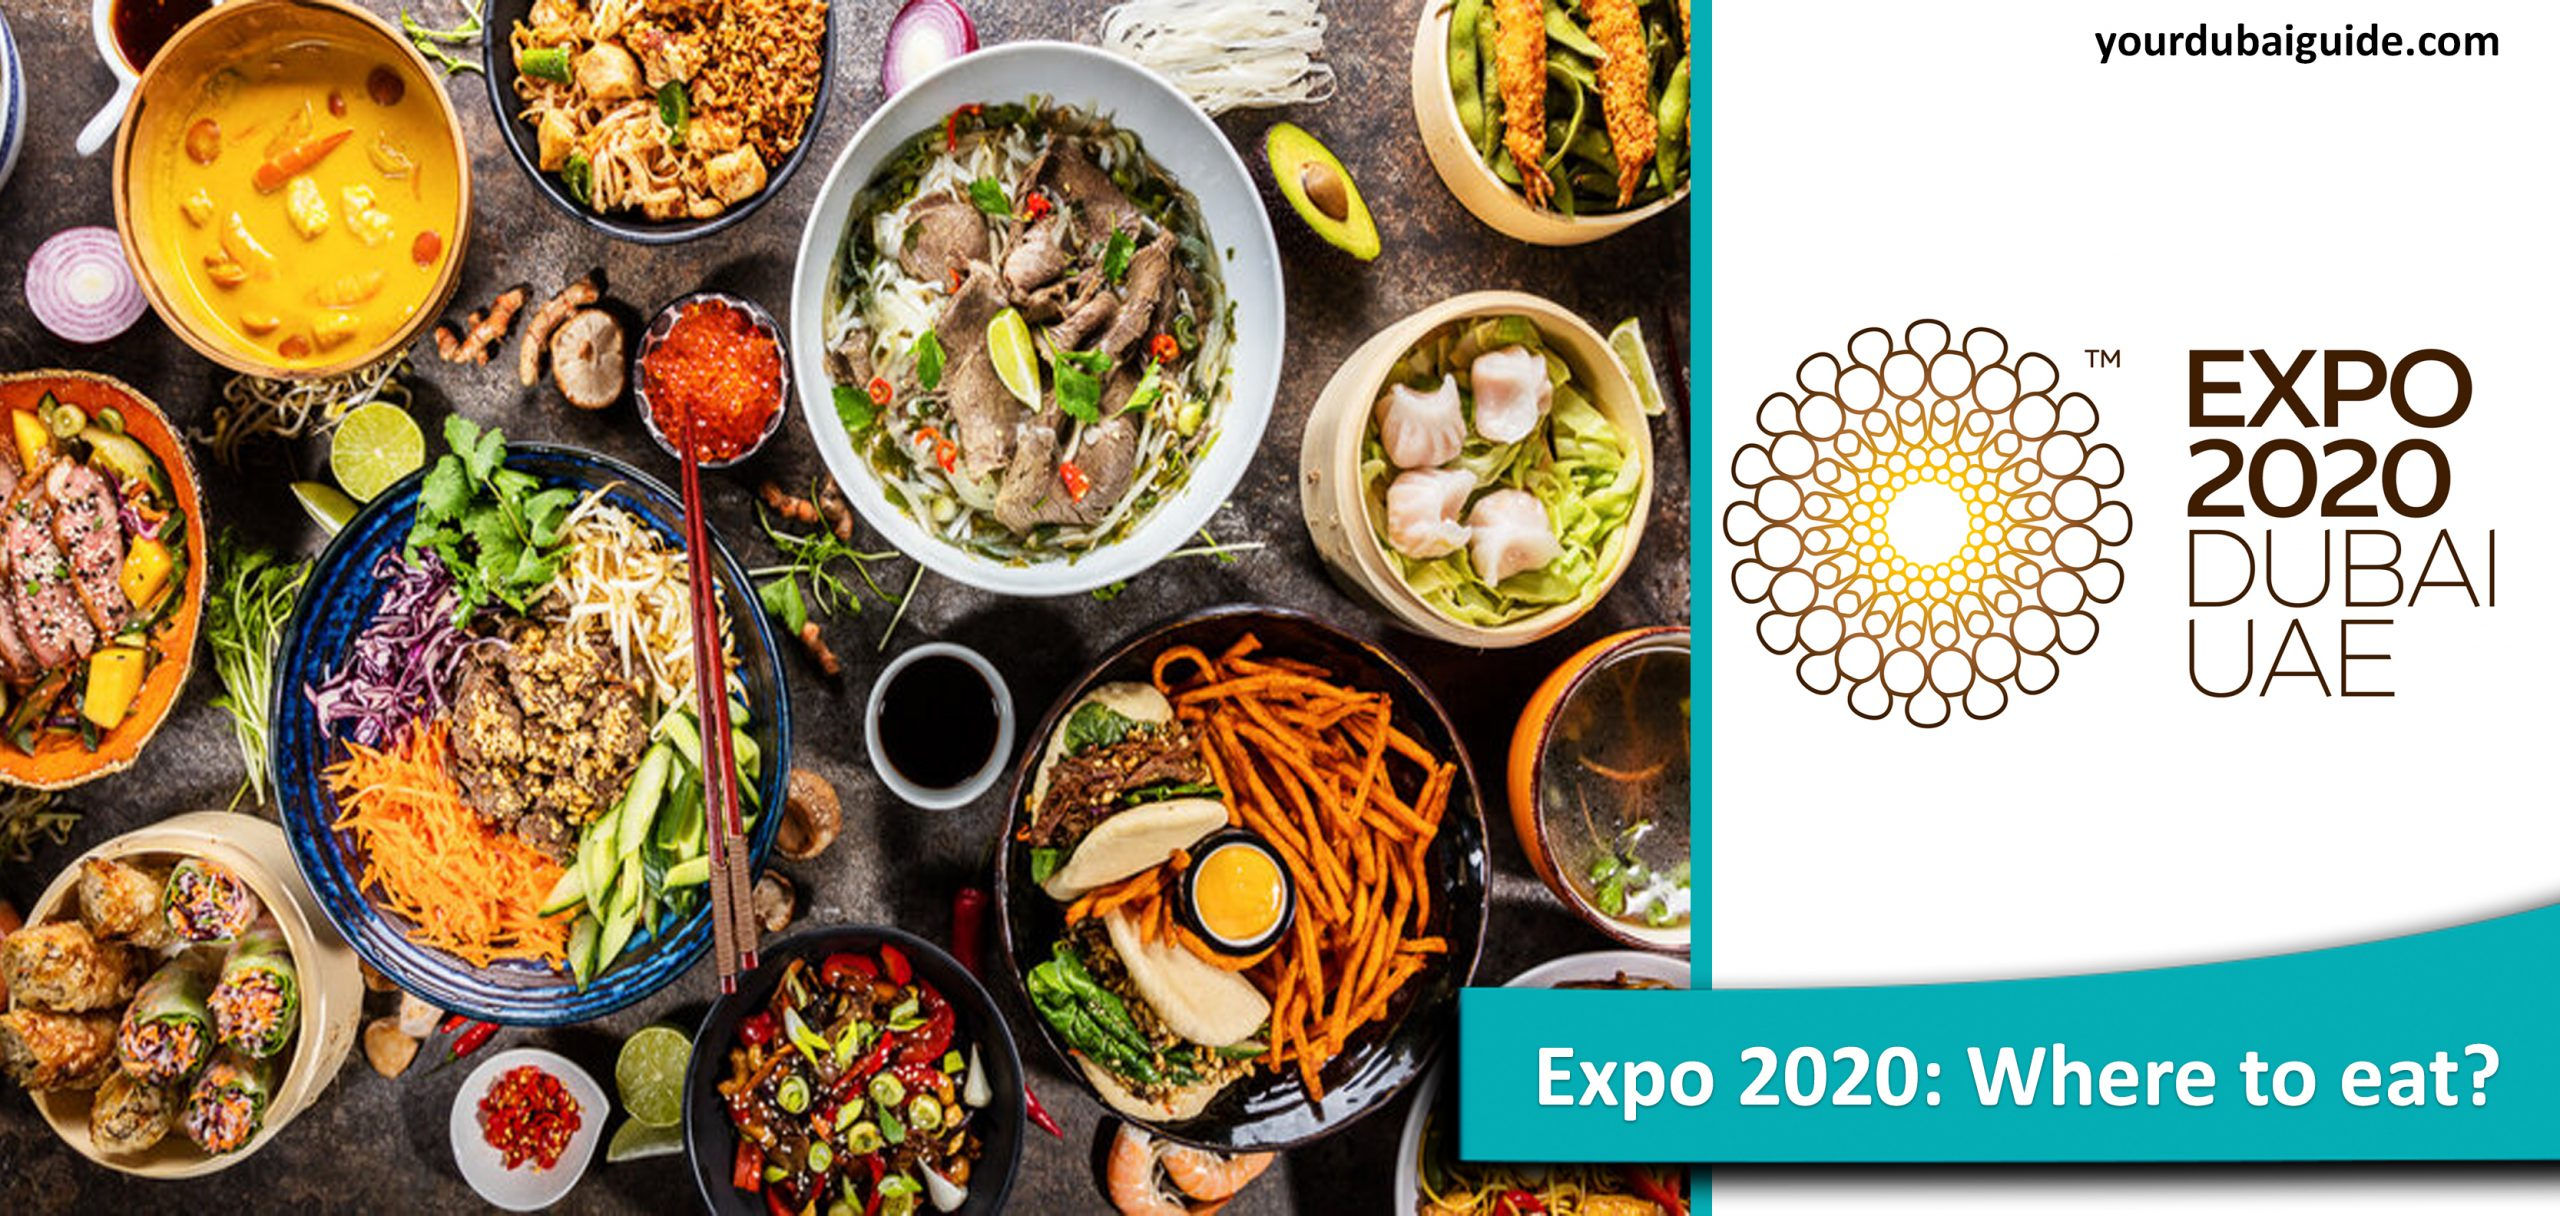 Expo 2020: Where to eat?